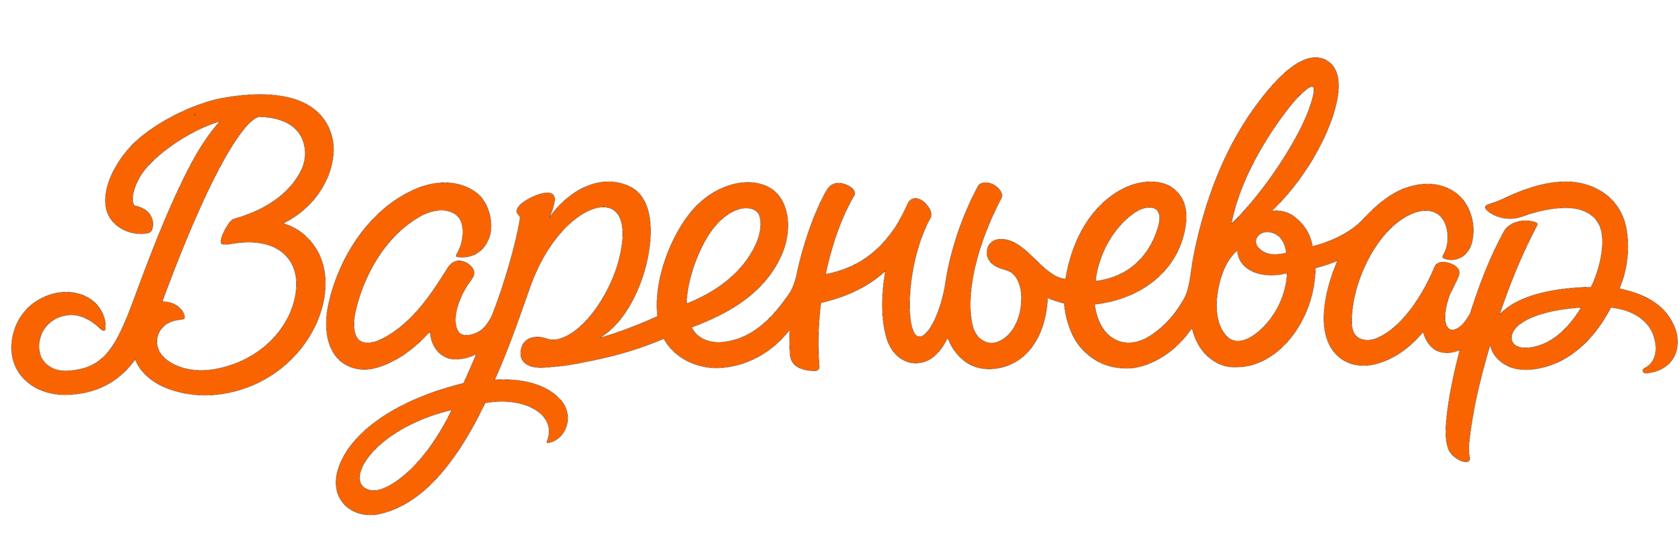 ВАРЕНЬЕВАР